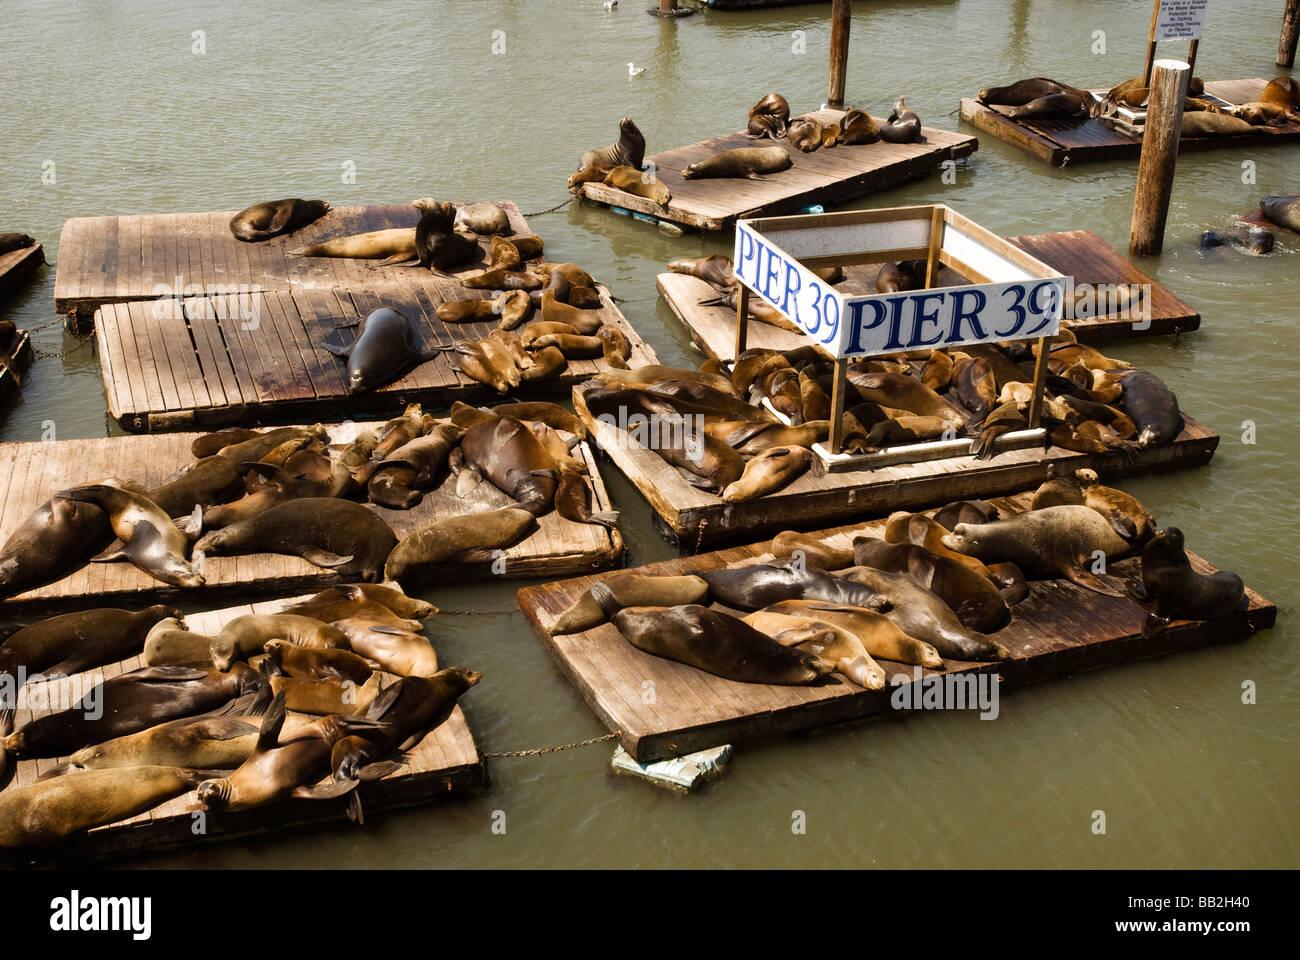 Pier 39 Sea Lions - Stock Image